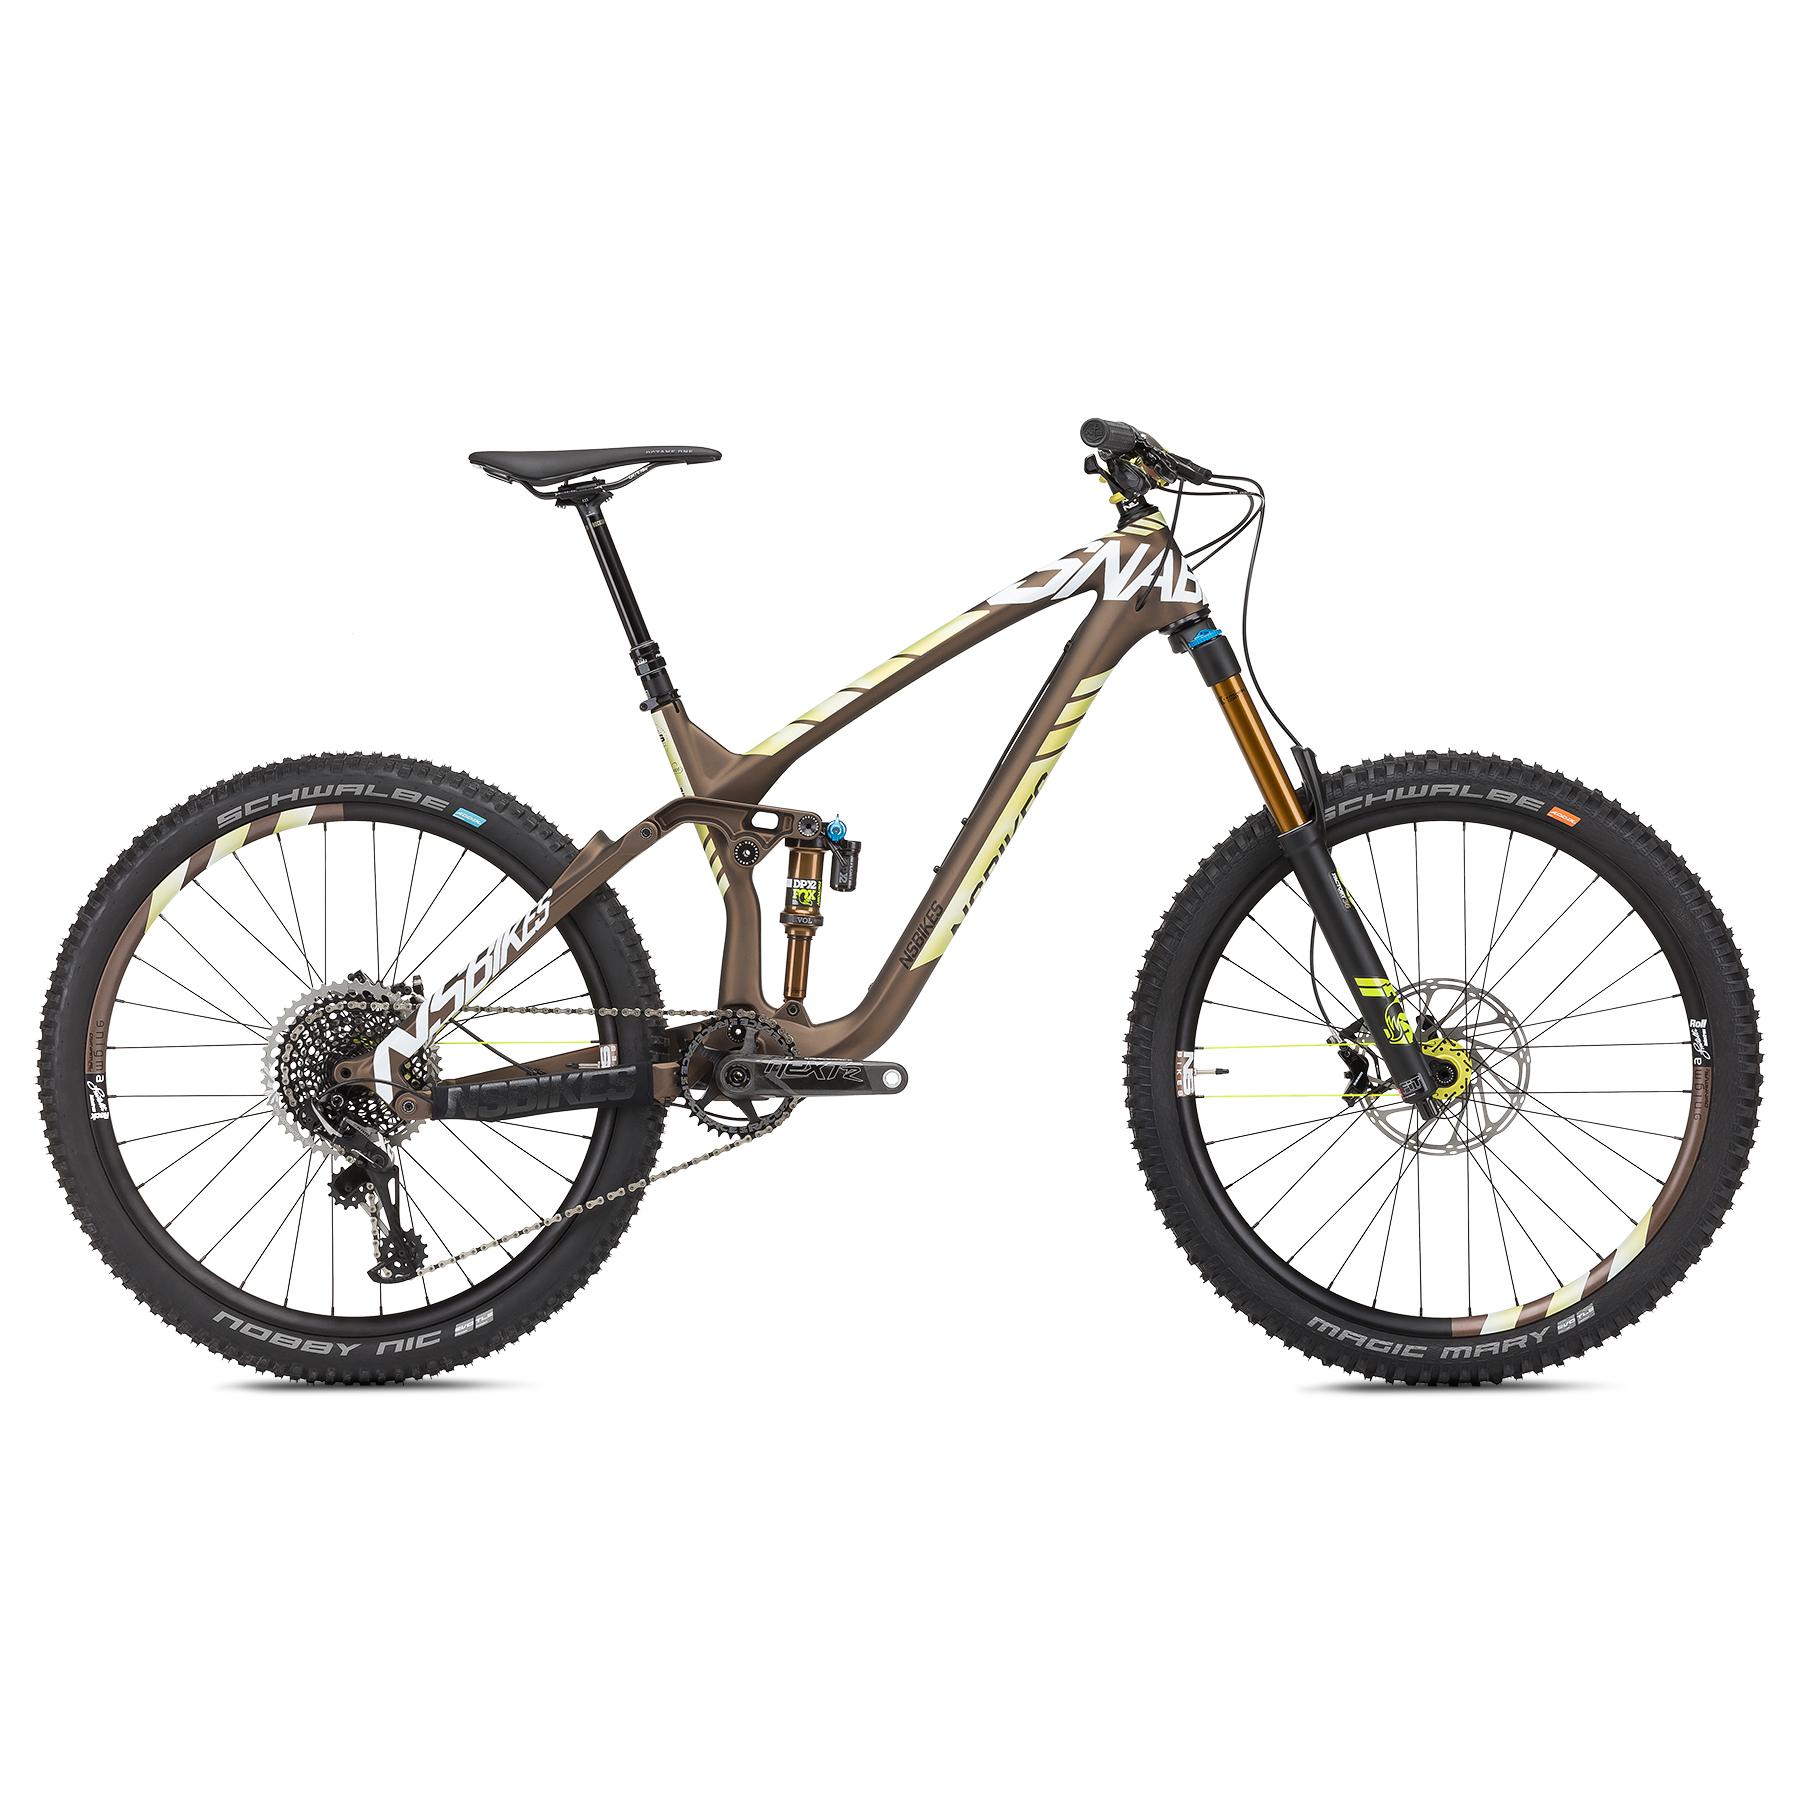 ns bikes snabb 160 c1 650b carbon enduro pro mountainbike. Black Bedroom Furniture Sets. Home Design Ideas